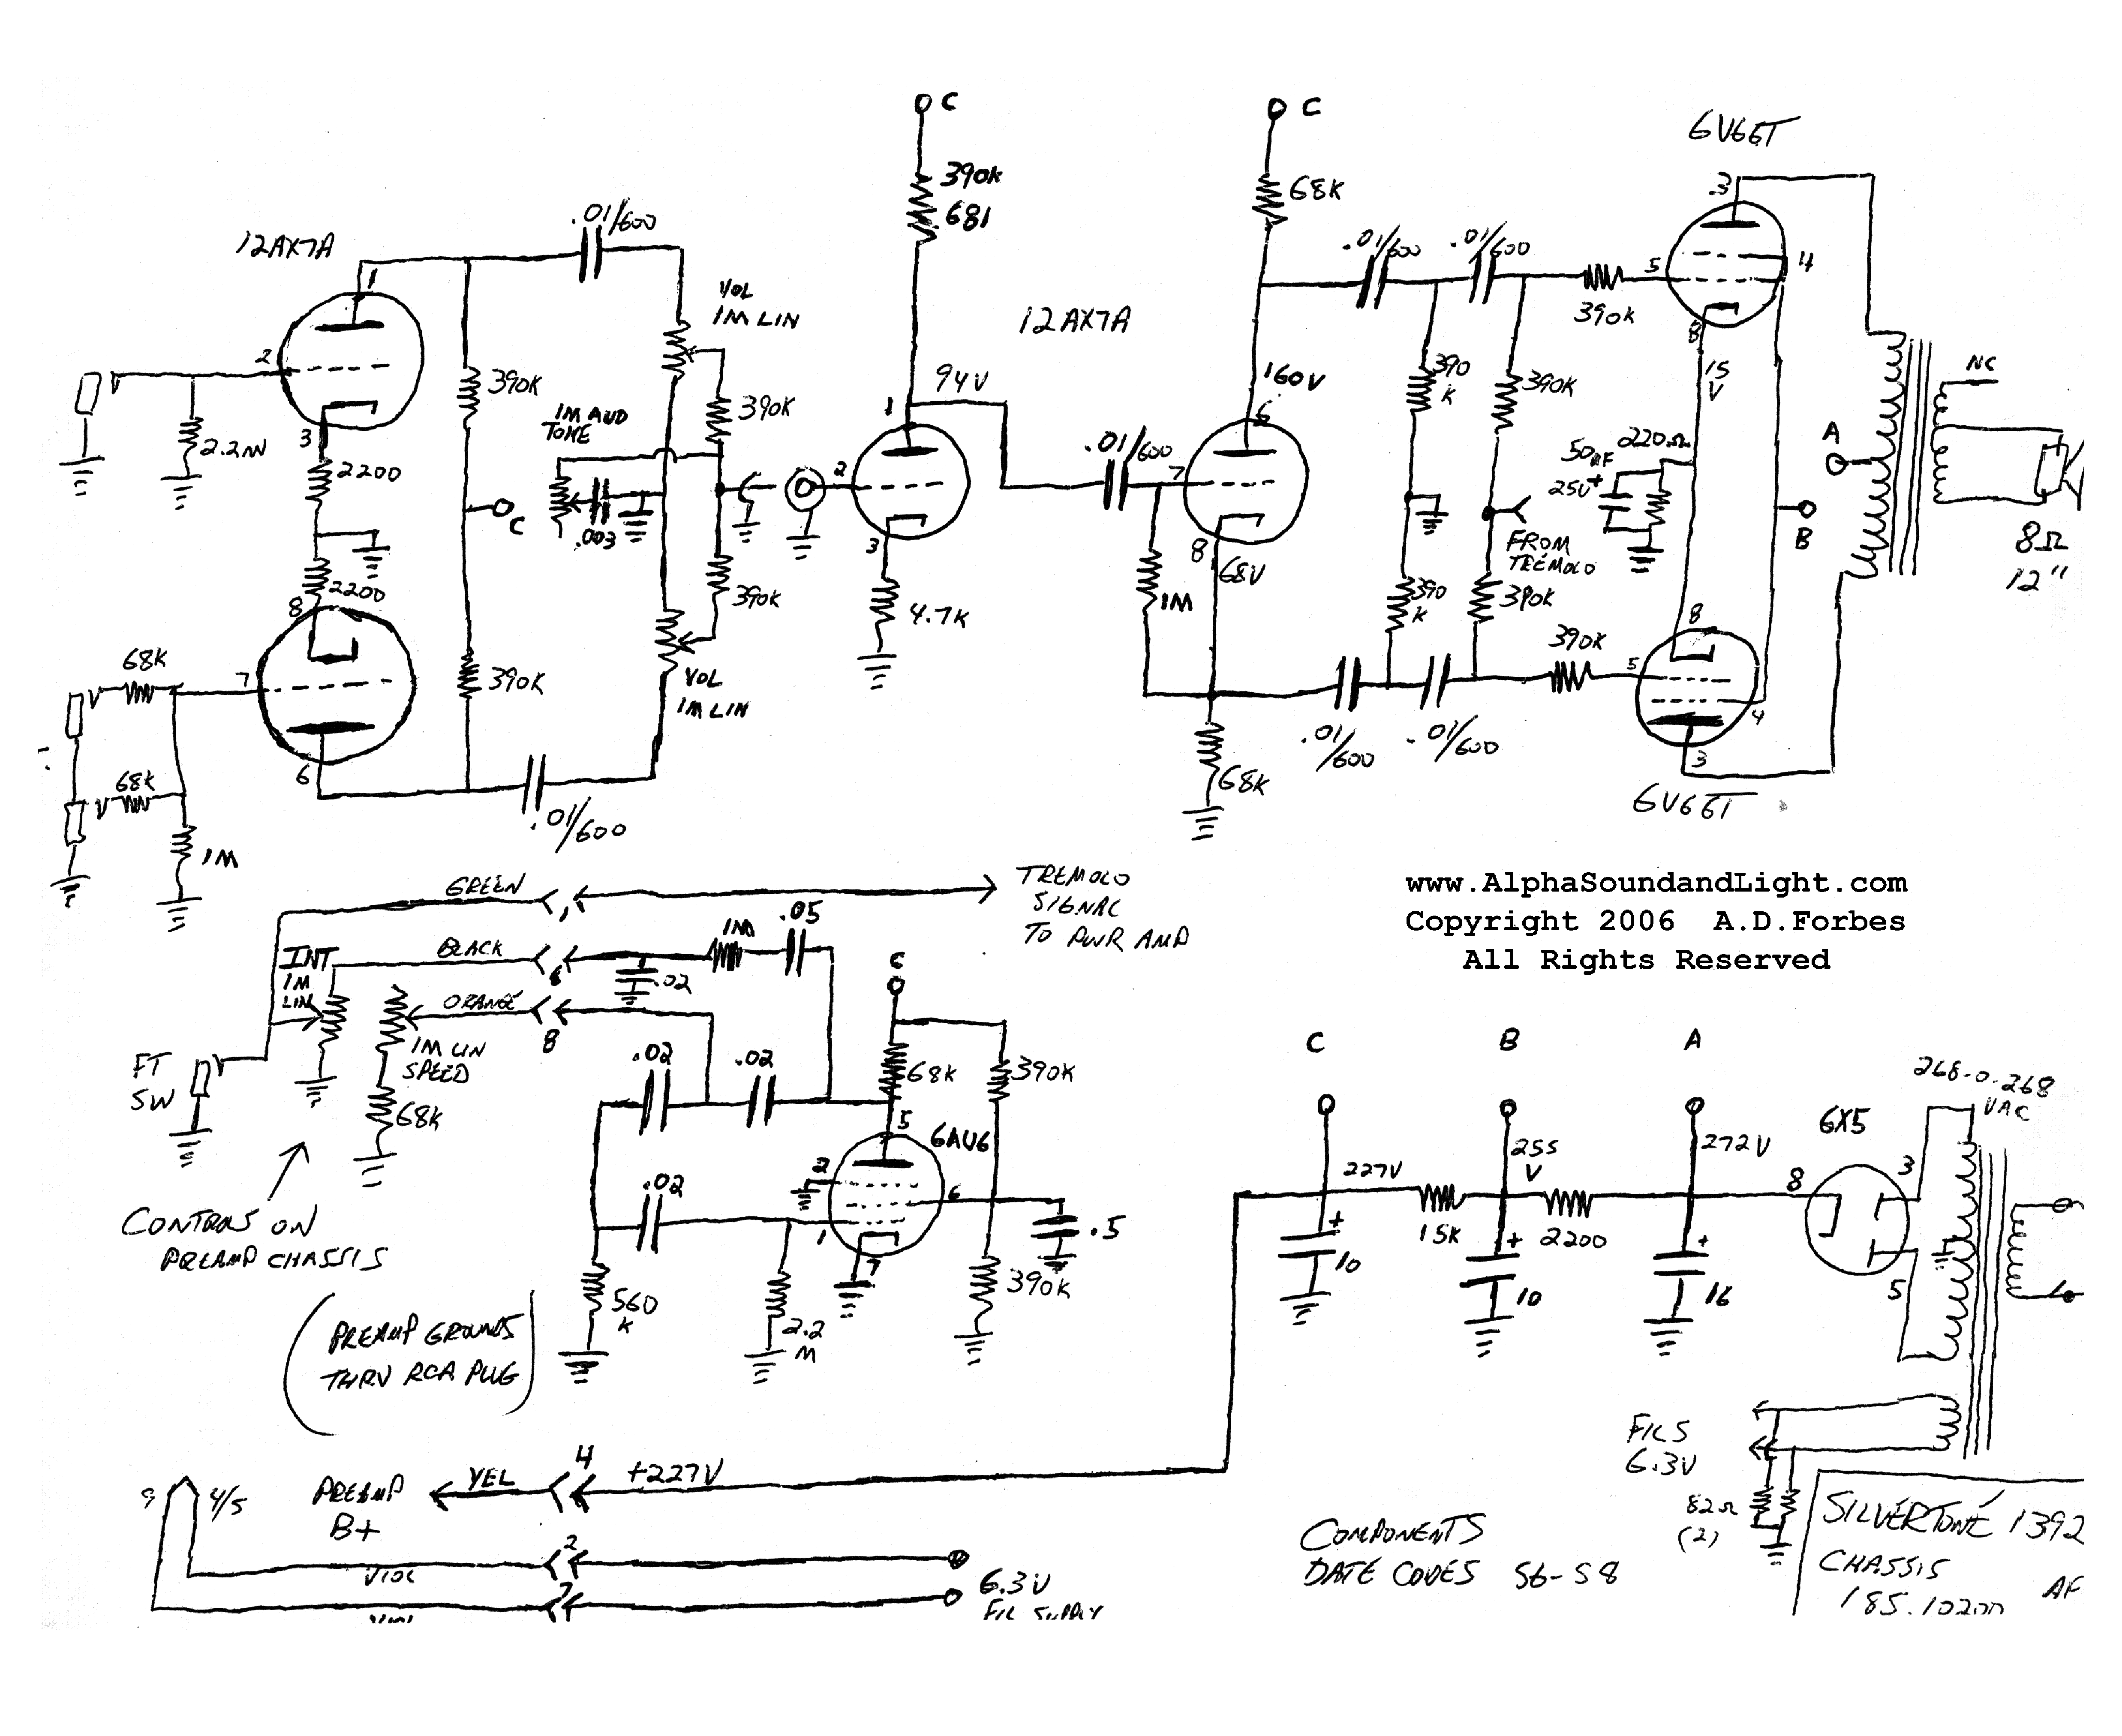 silvertone schematic best wiring library 9-Volt Transistor Radio silvertone 1392 sch service manual 1st page